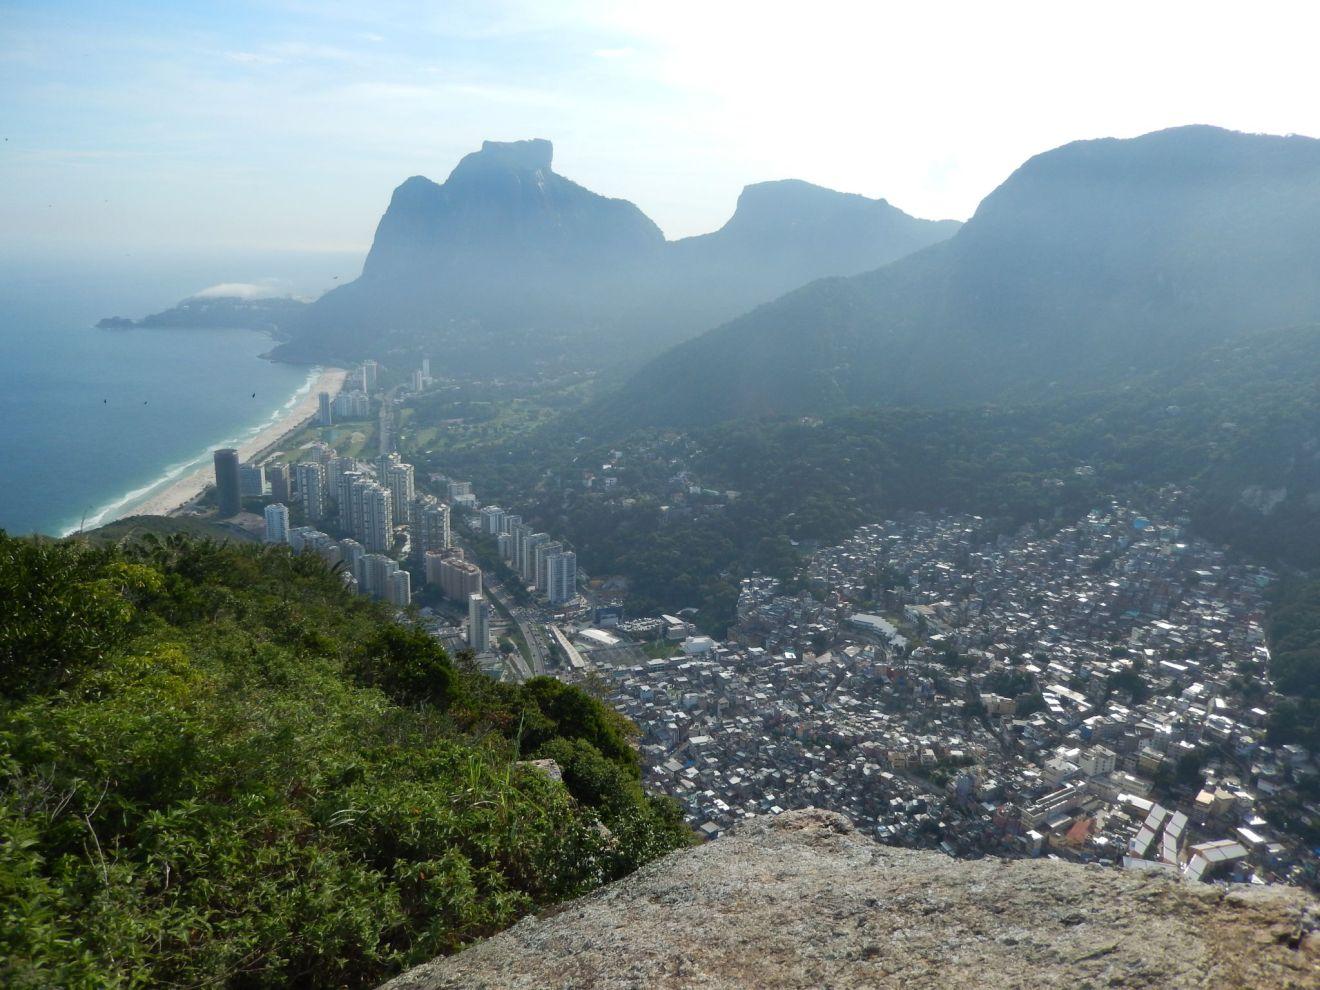 Brazilian drug traffickers cargo theft